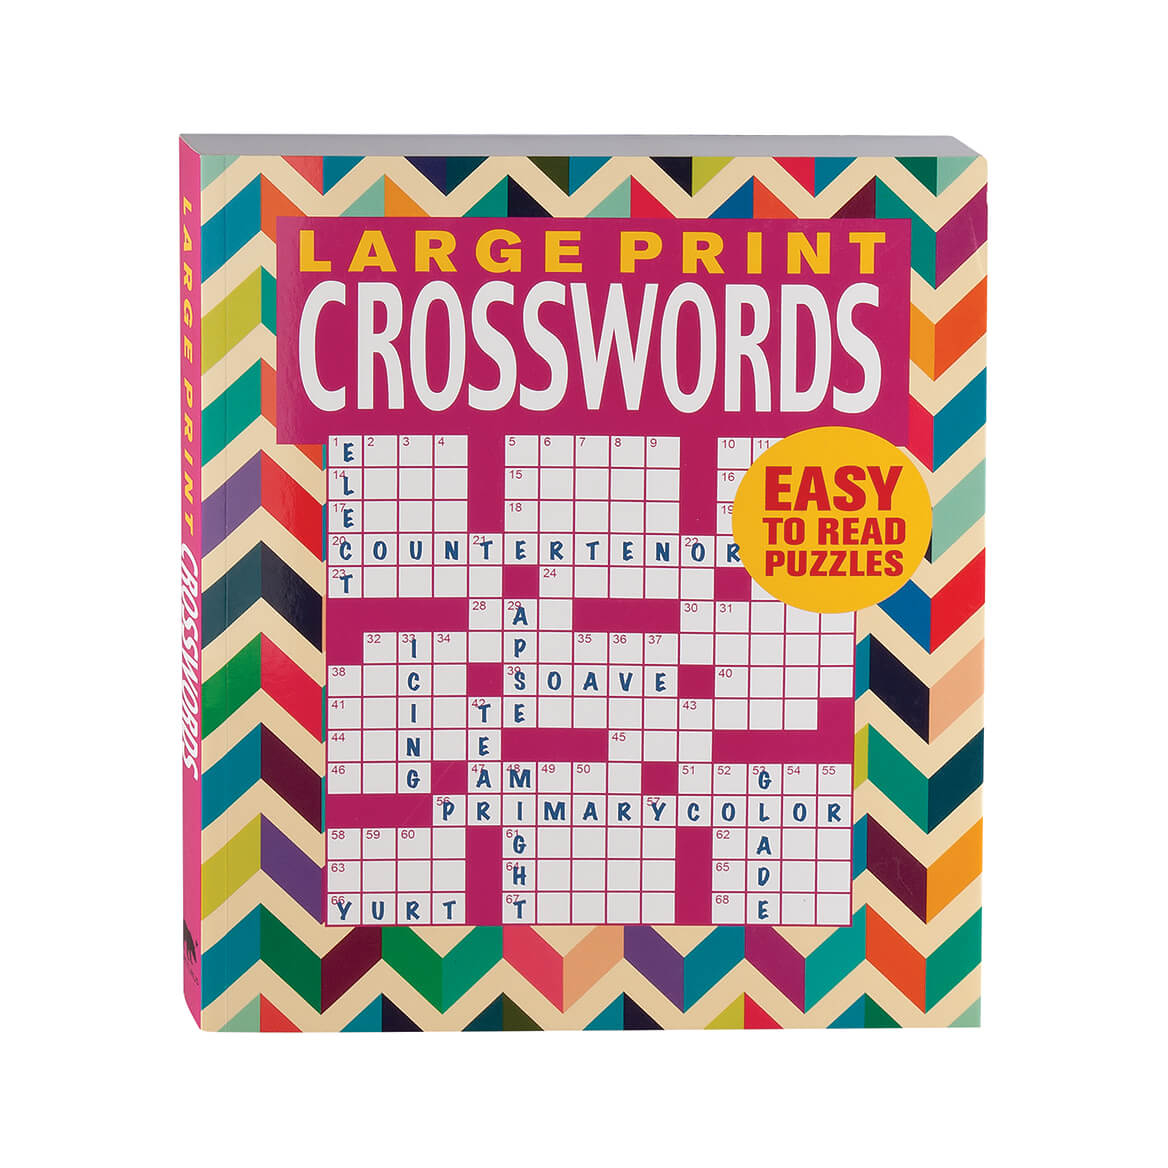 Large Print Crosswords Book - Puzzle Book - Miles Kimball - Large Print Crossword Puzzle Books For Seniors